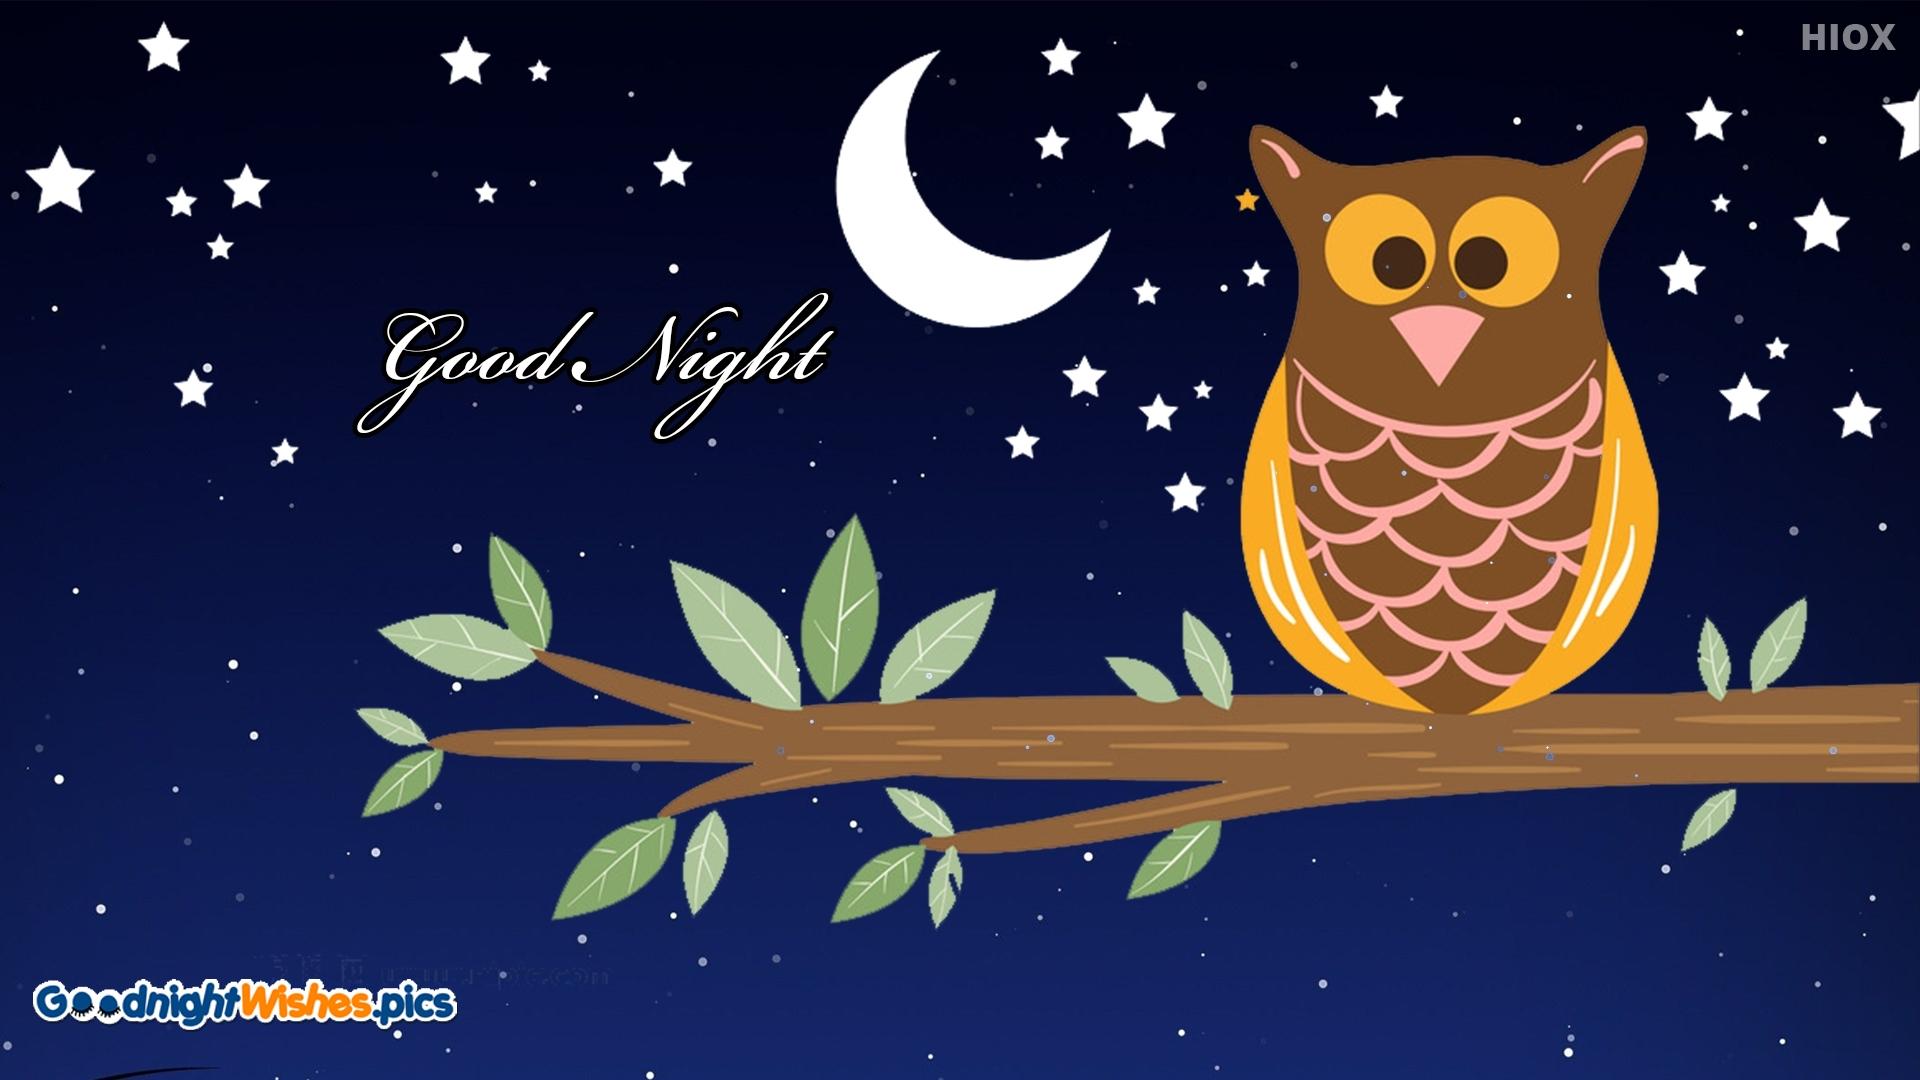 Good Night Wishes Cartoon